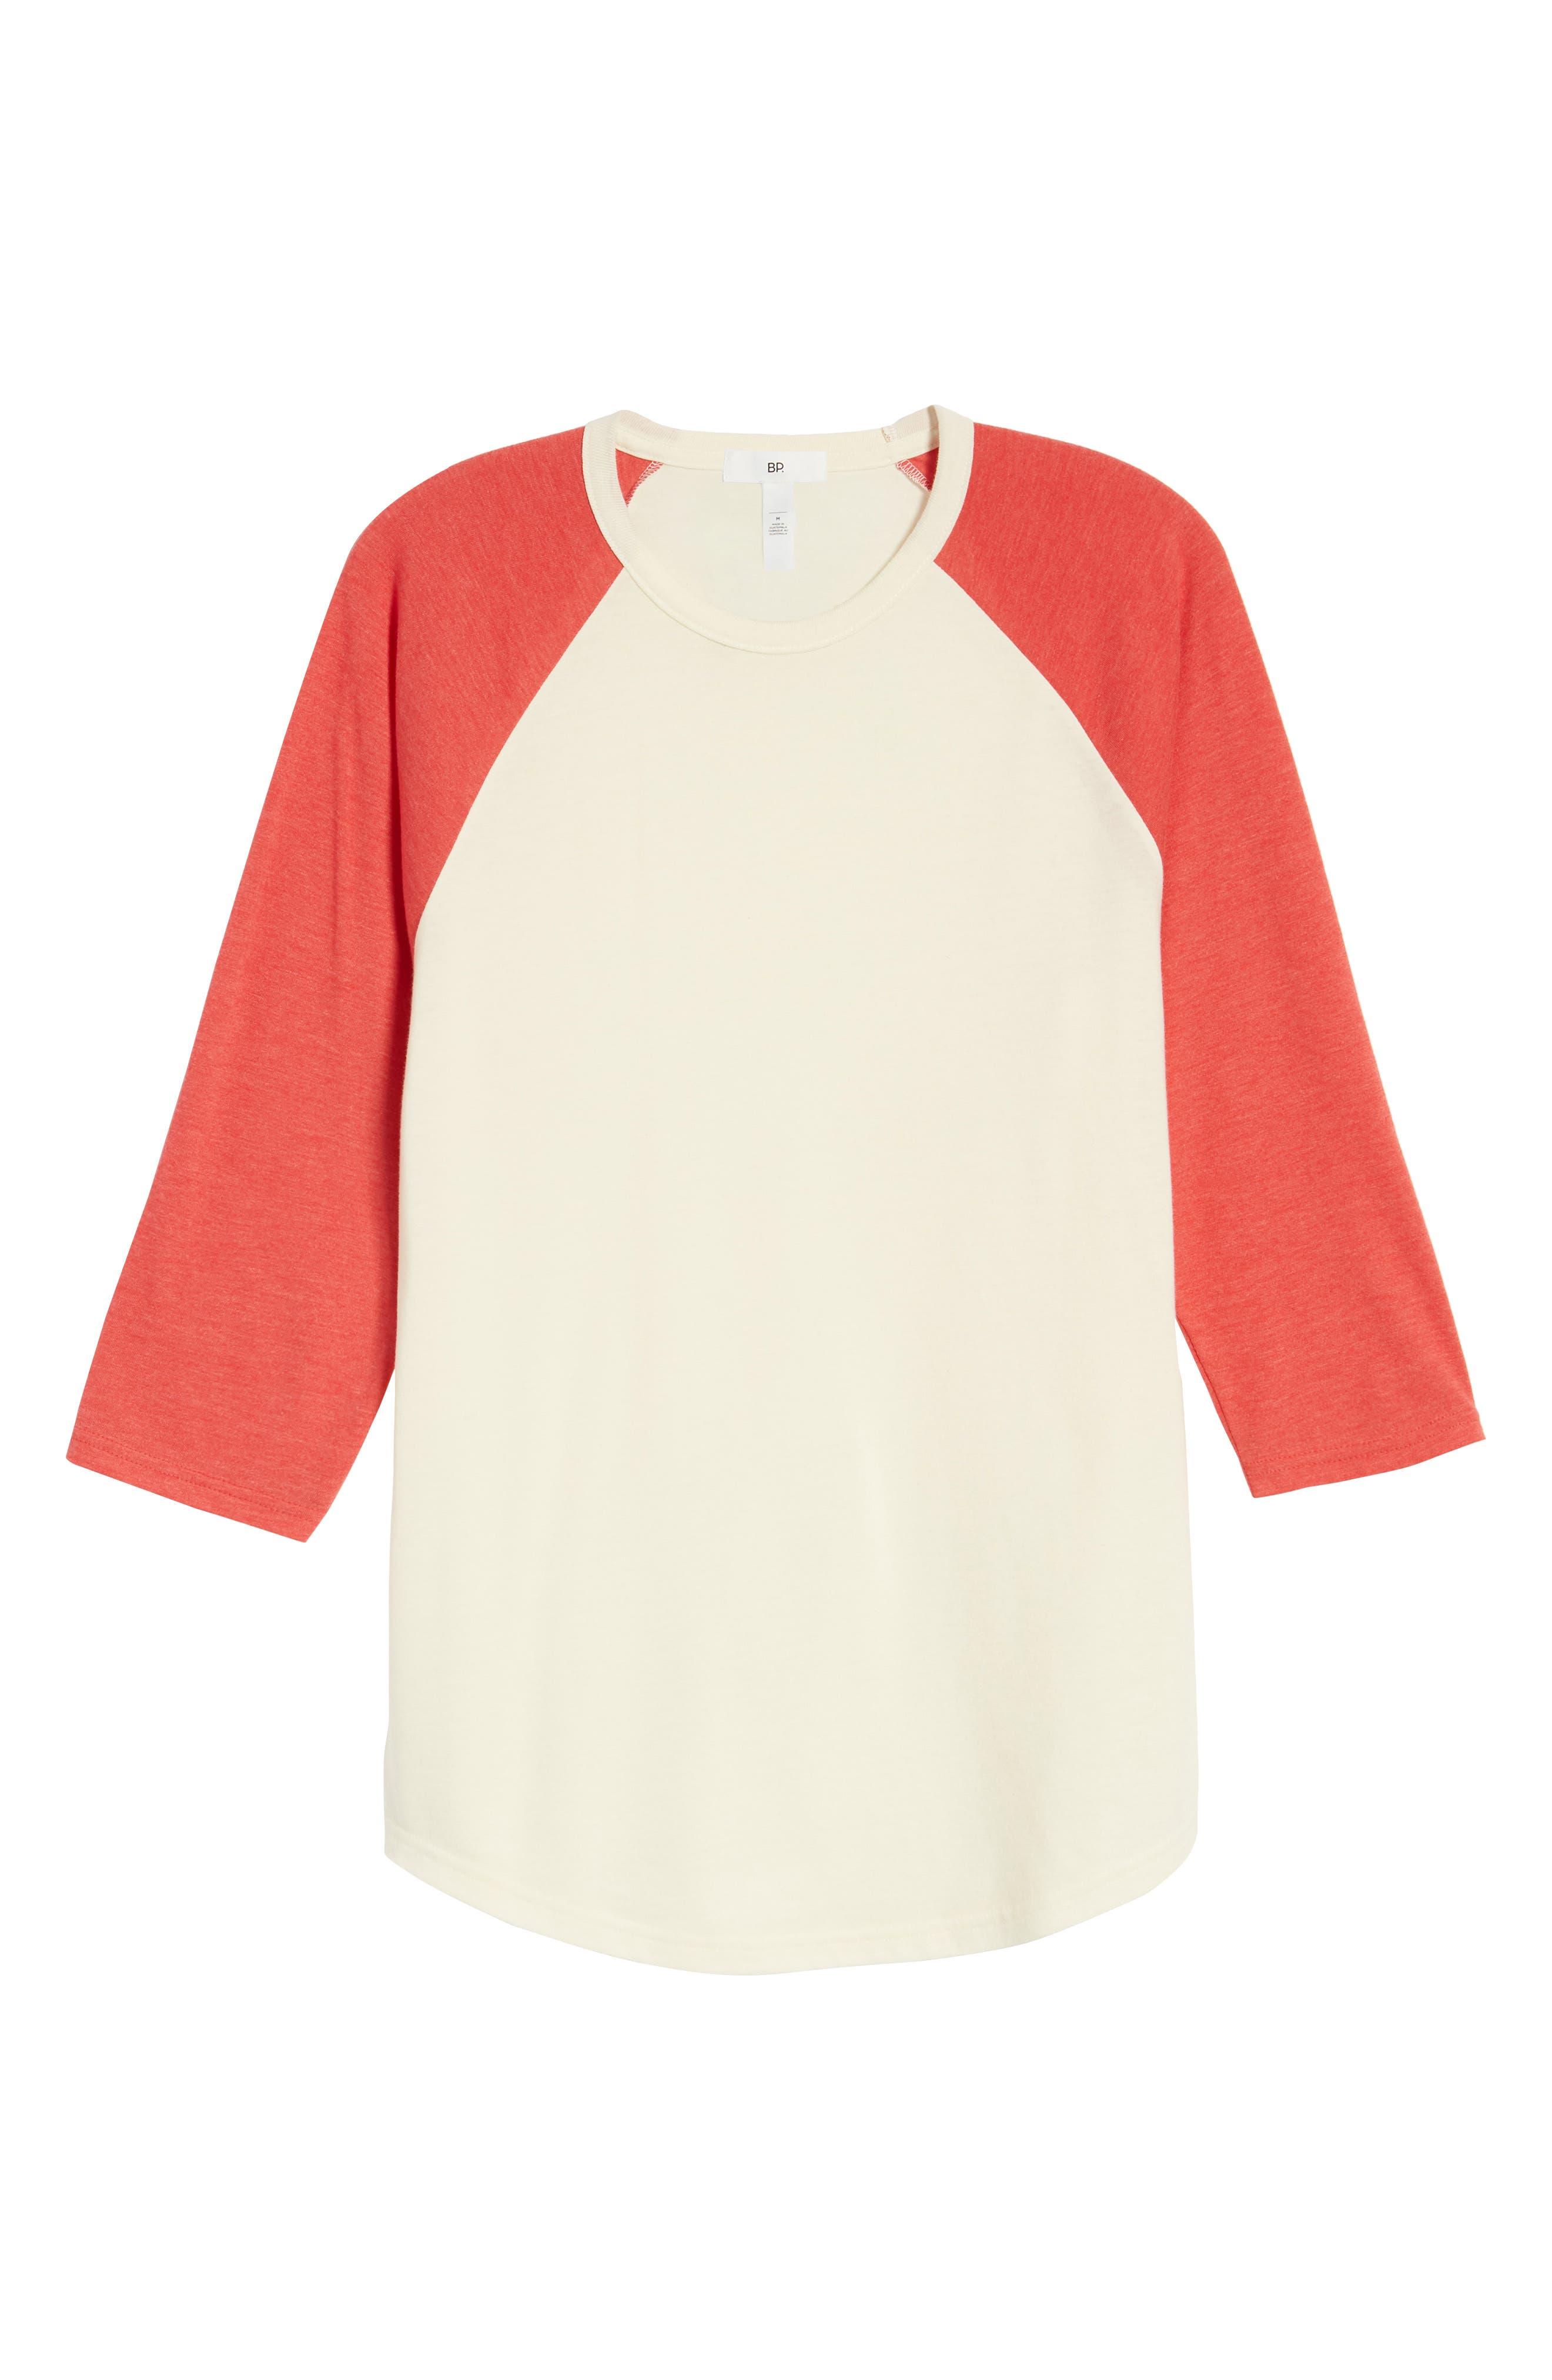 Baseball T-Shirt,                             Alternate thumbnail 6, color,                             IVORY EGRET-RED SAUCY